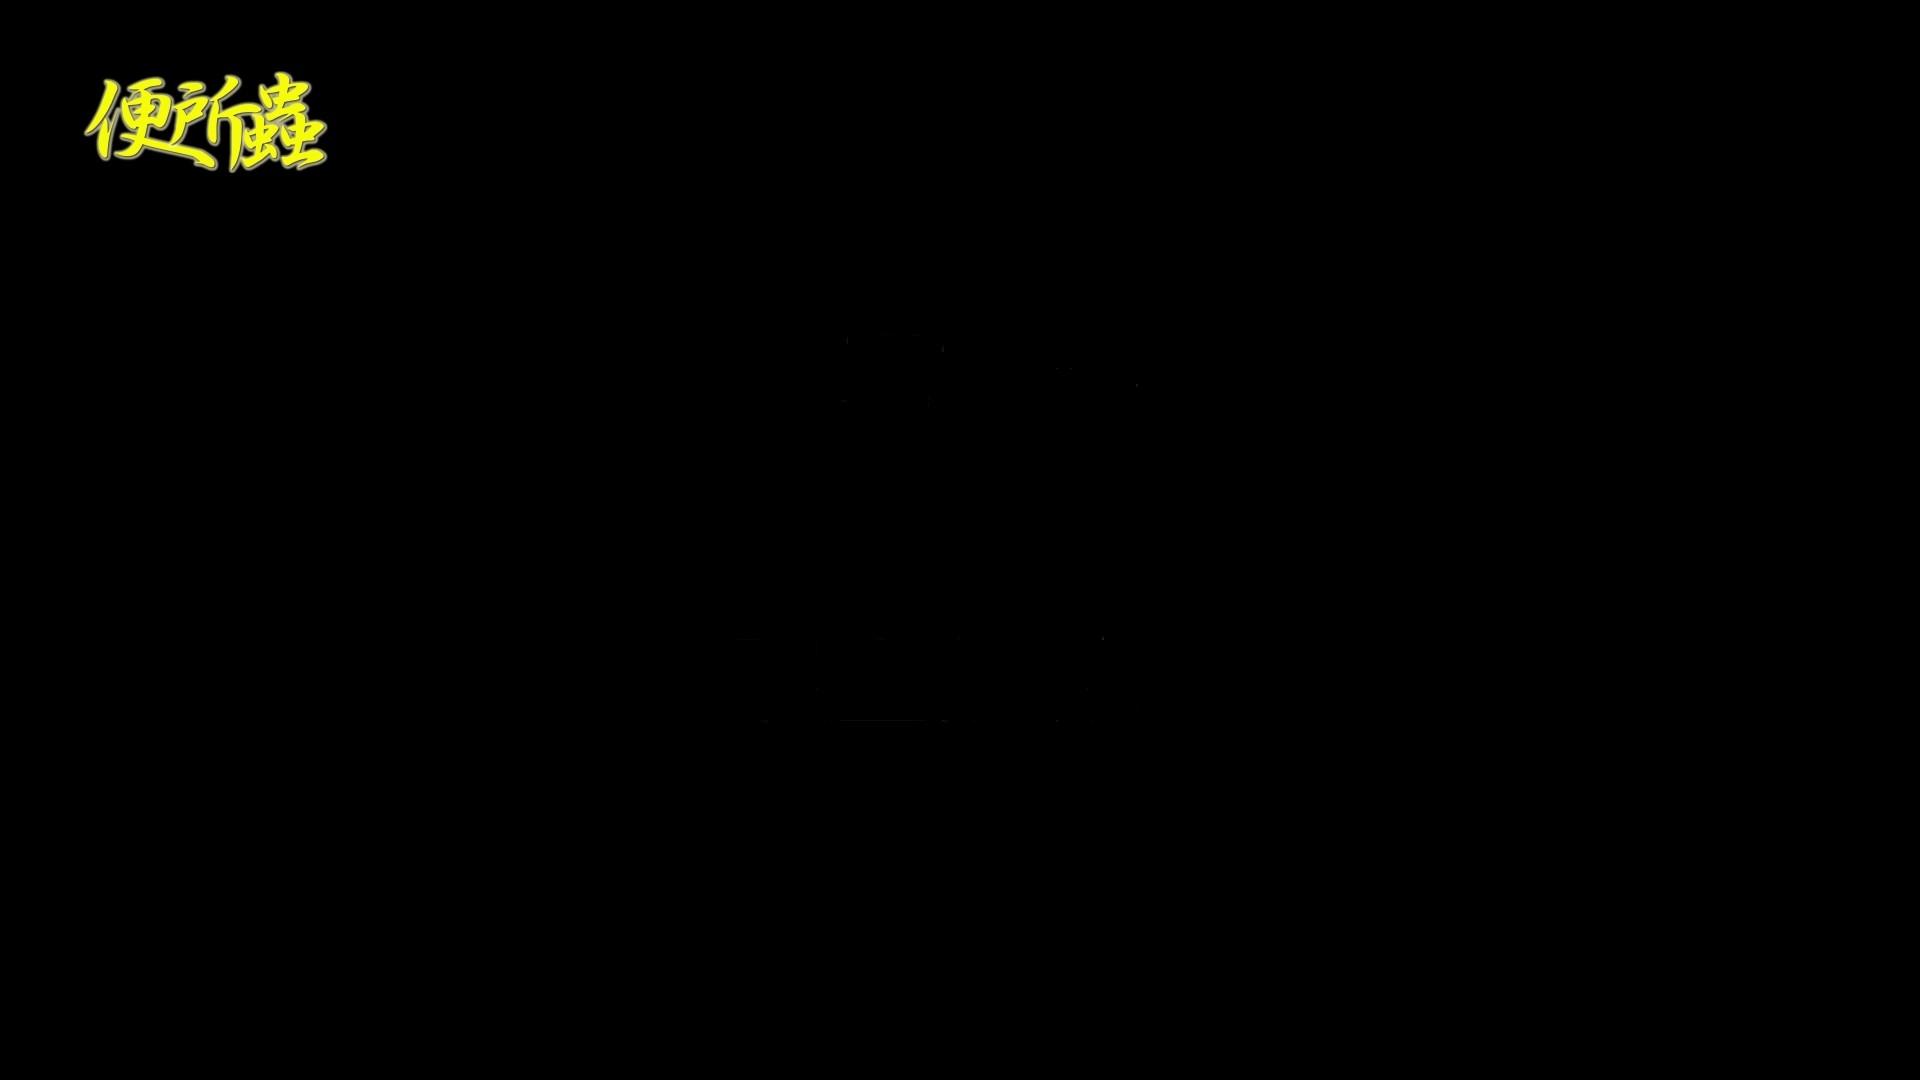 vol.02 便所蟲さんのリターン~寺子屋洗面所盗撮~ 盗撮 ワレメ動画紹介 102PIX 42